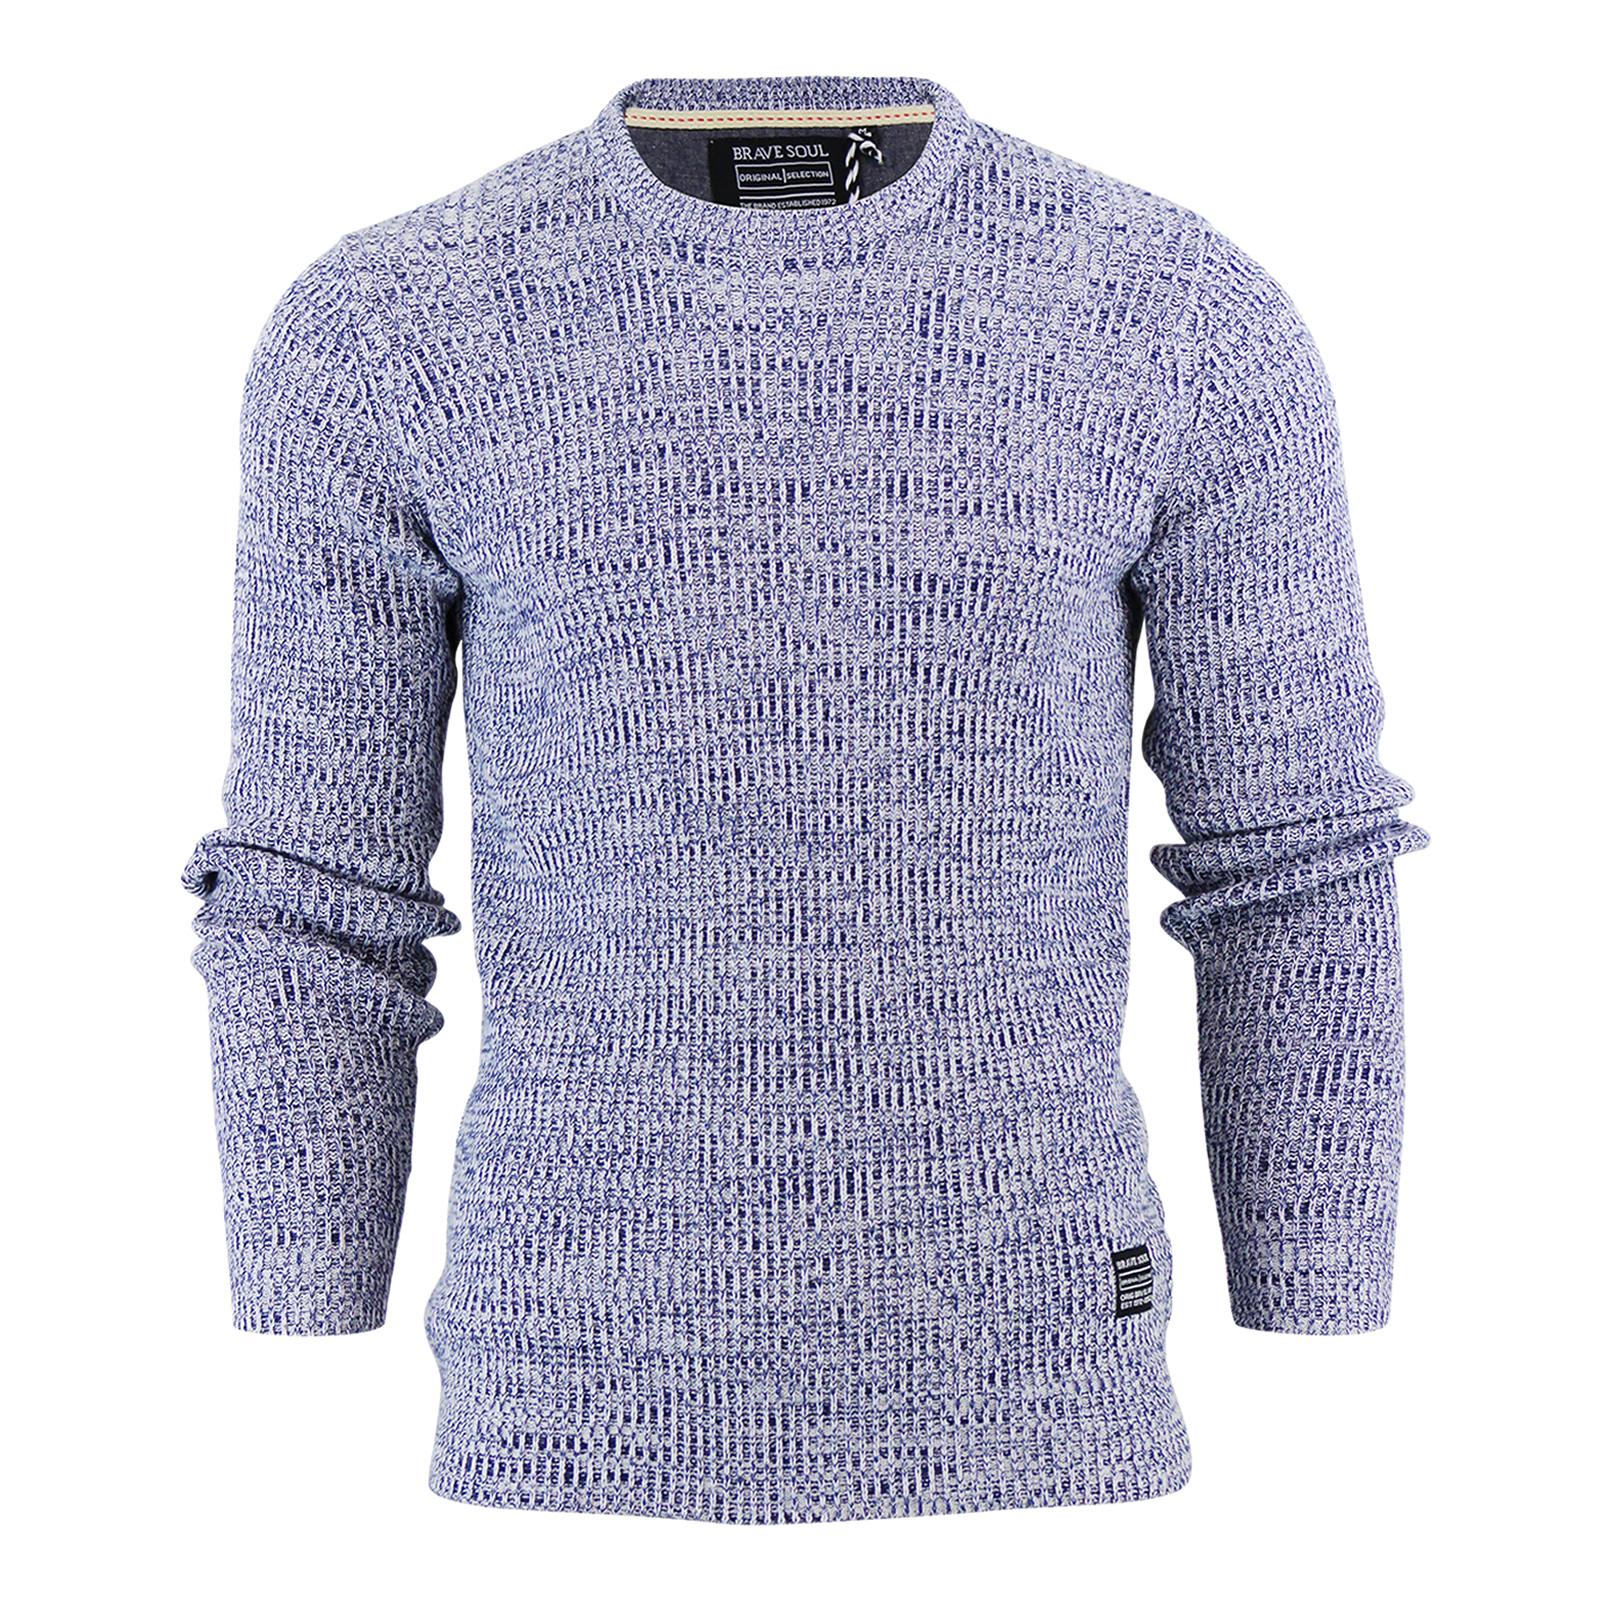 Knitting Pattern Crew Neck Jumper : Mens Jumper Brave Soul Gomez Cotton Crew Neck Knitted Sweater eBay